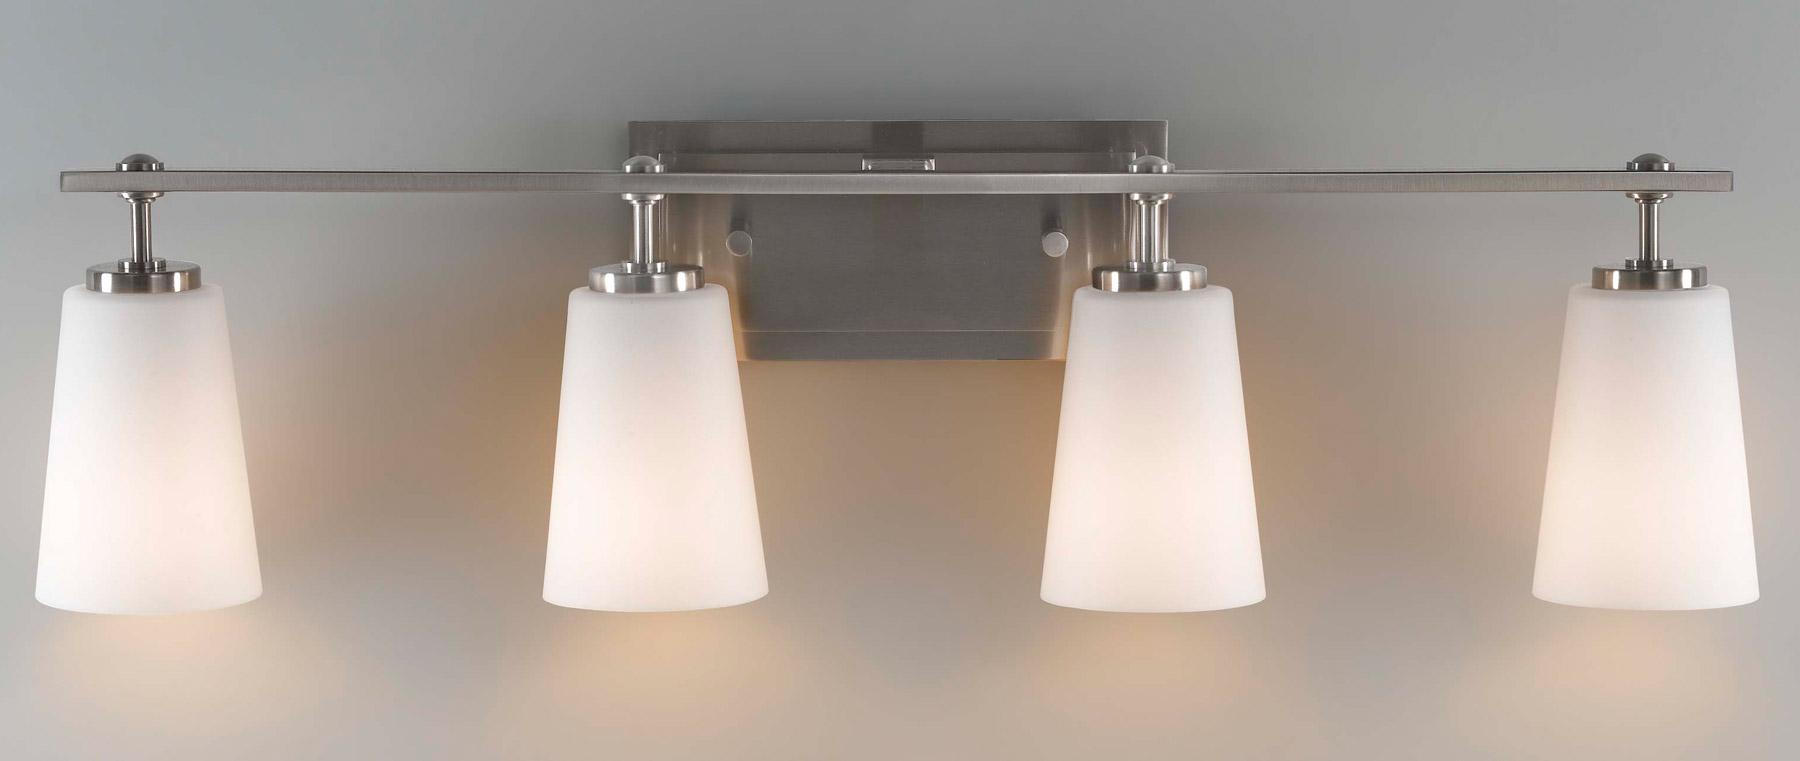 wall lighting bathroom vanity lights murray feiss vs14904 bs. Black Bedroom Furniture Sets. Home Design Ideas